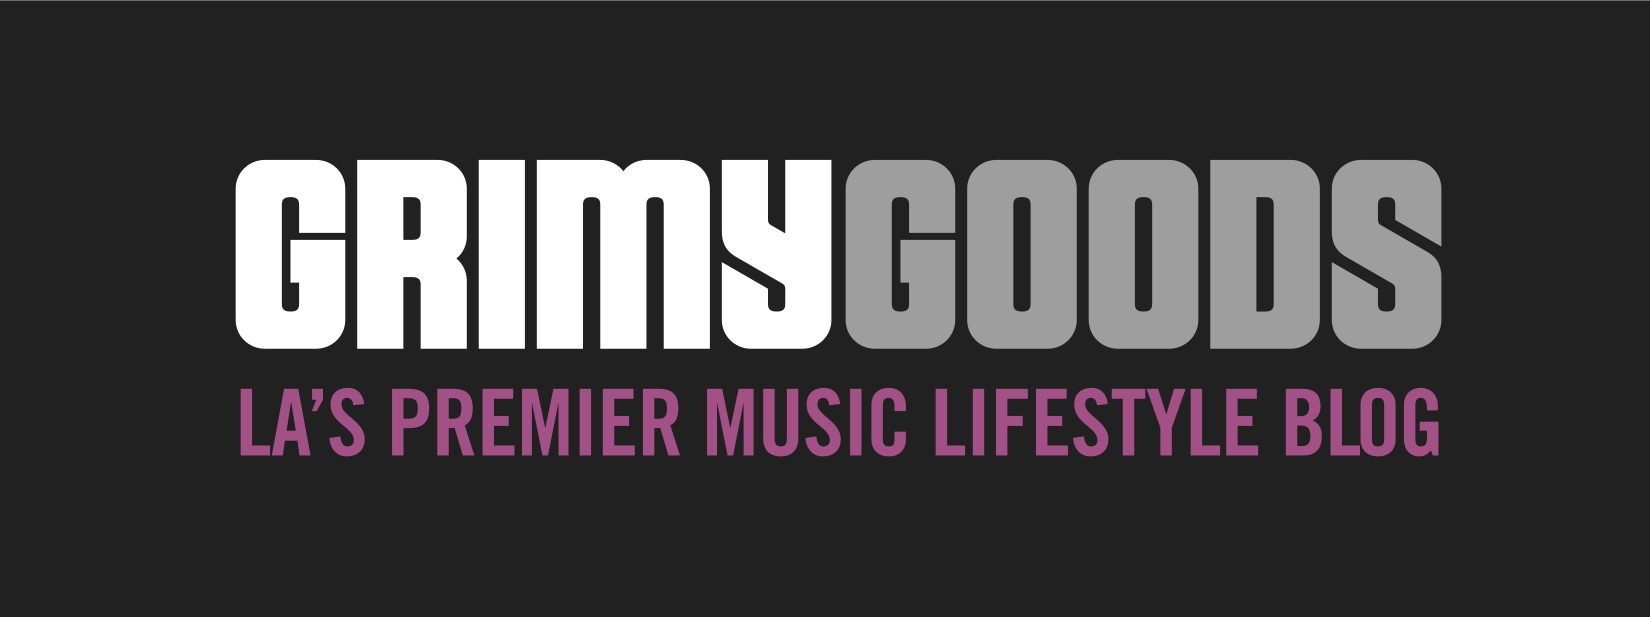 grimy goods logo footer